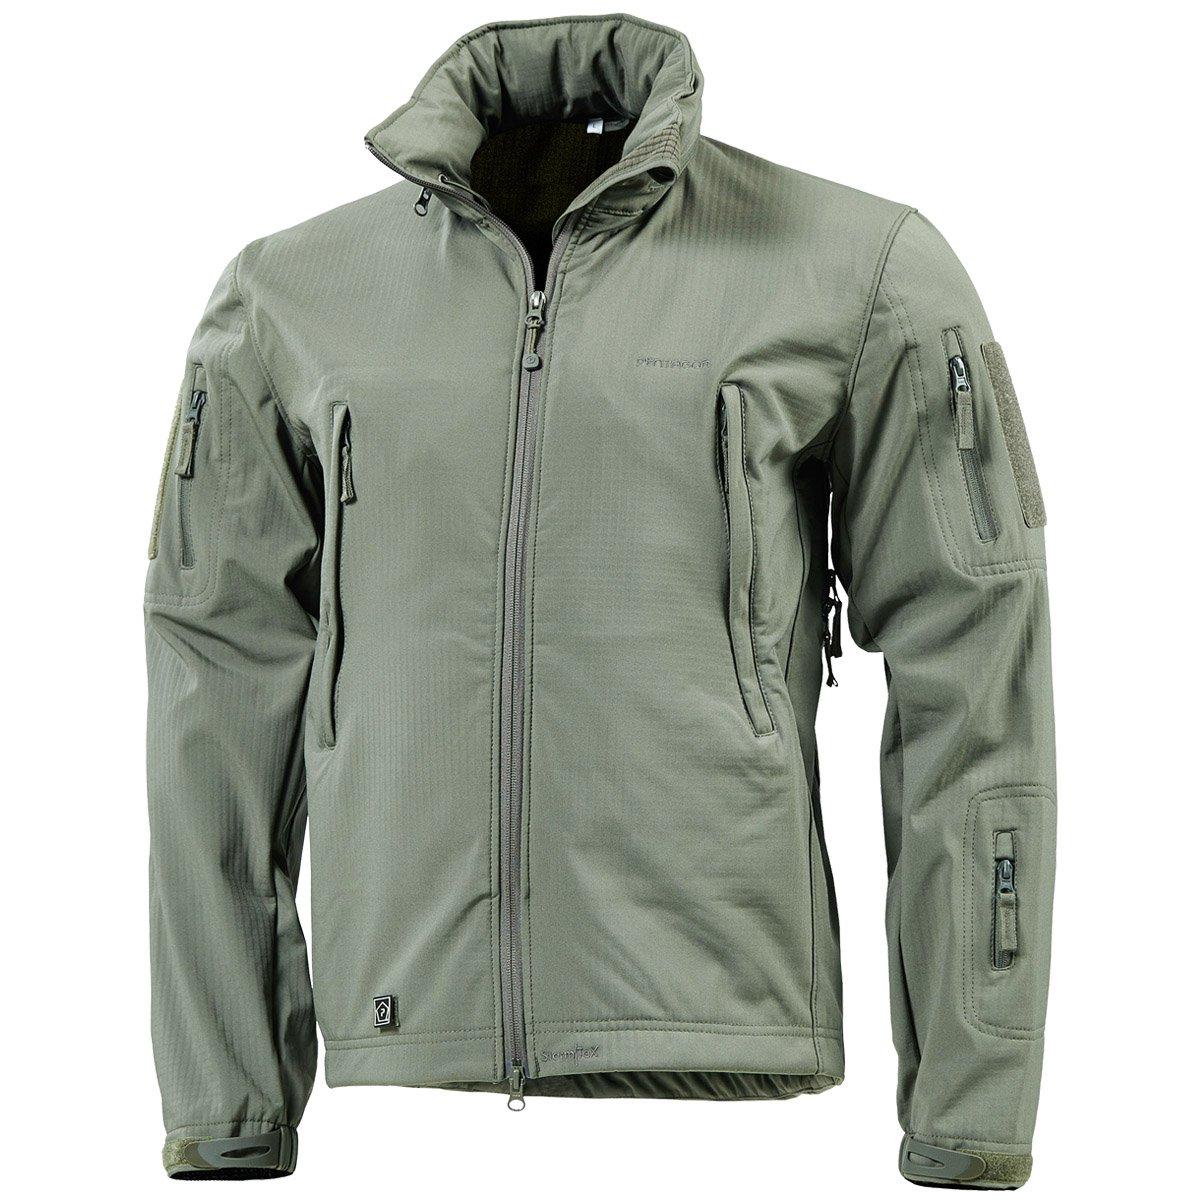 69f4728f928dc8 Pentagon Artaxes Men s Softshell Jacket Grindle Green  Amazon.co.uk   Clothing